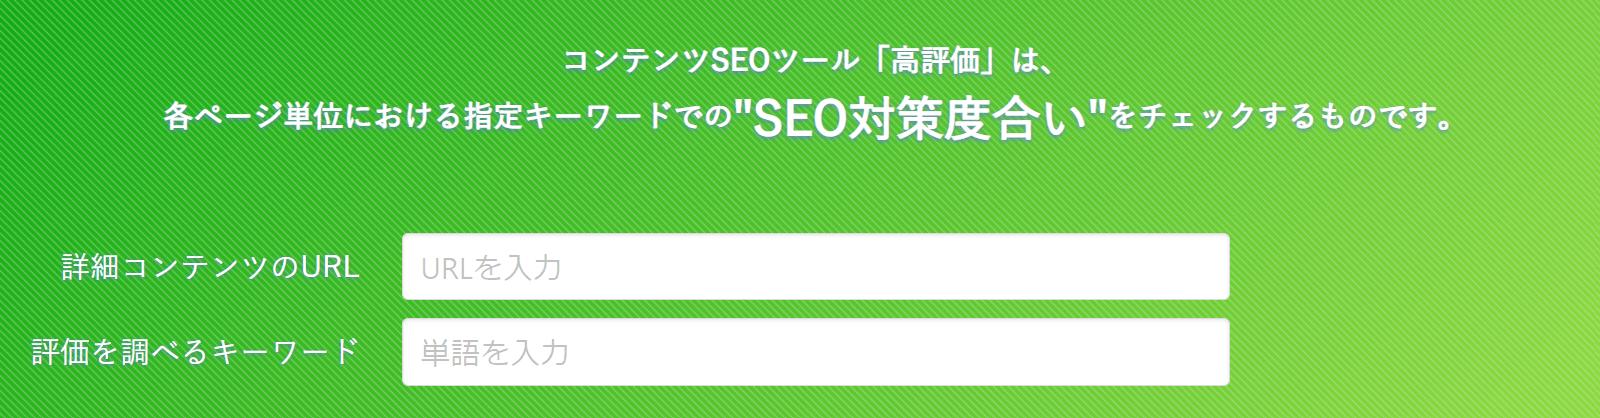 seotool4